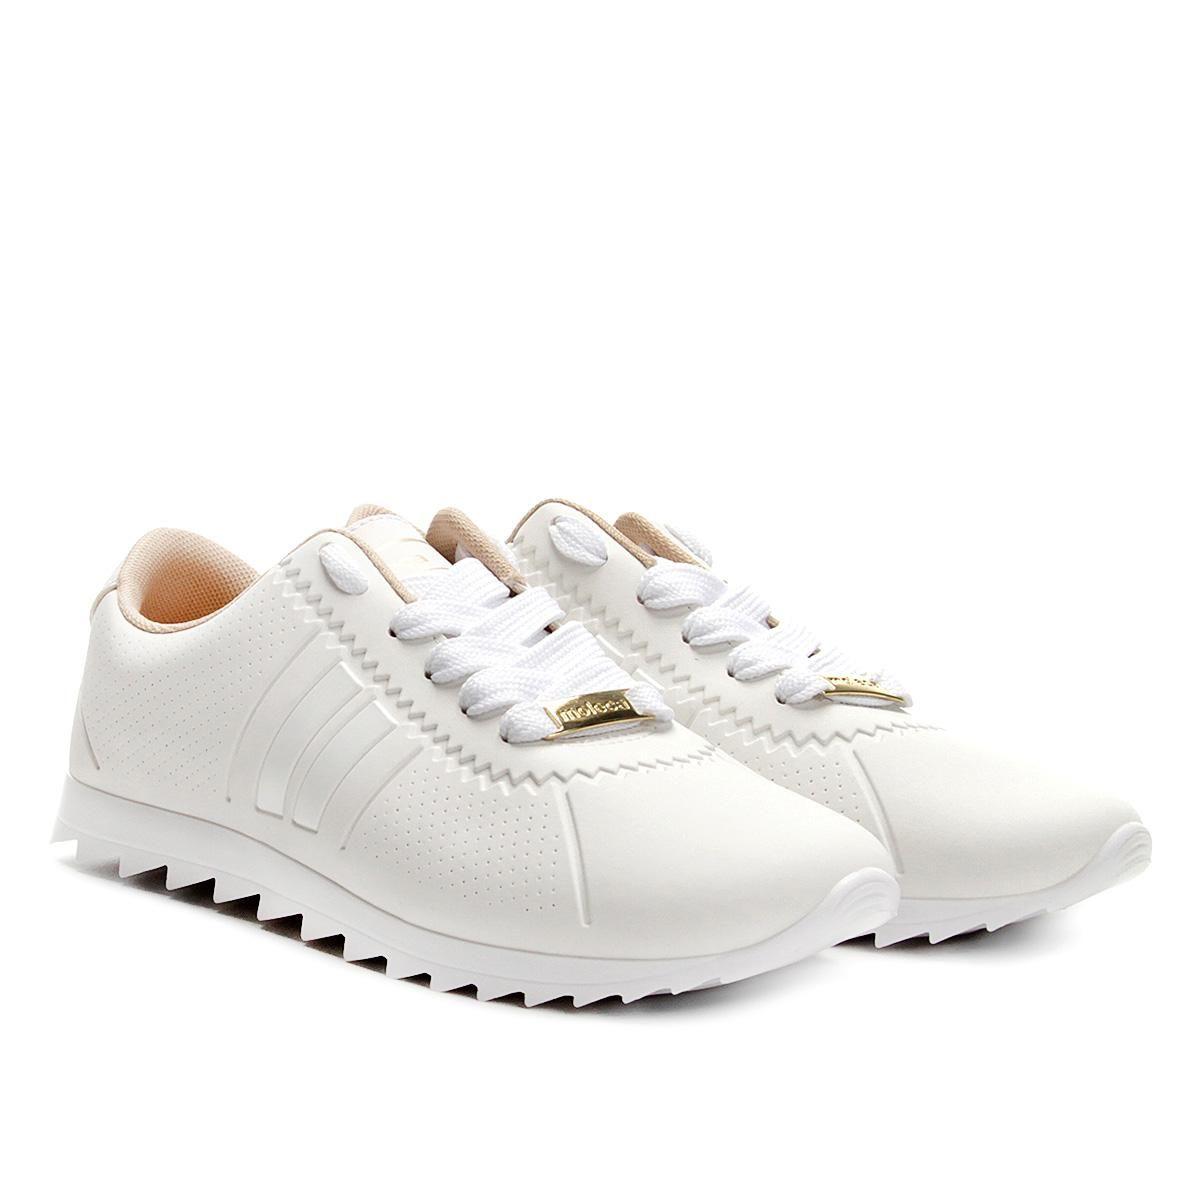 f6ede8cff5 tênis moleca jogging tira lateral feminino branco